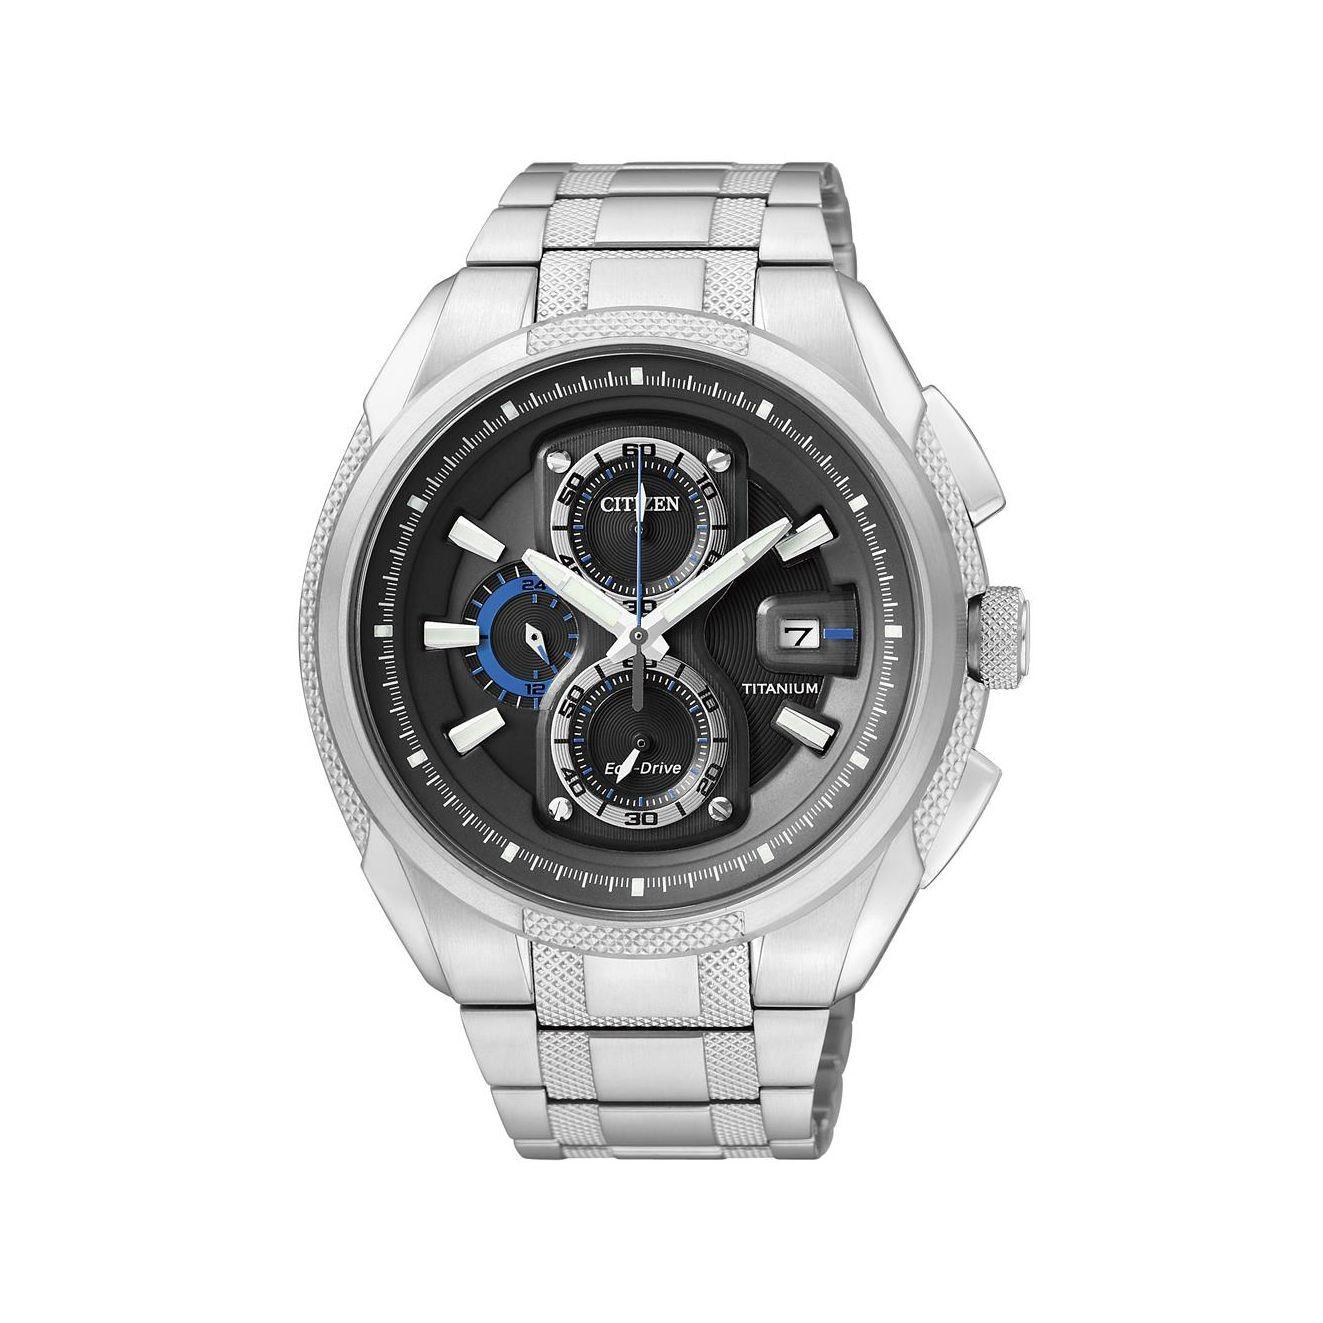 Montre Citizen Chronograph CA0200-54E vue 1